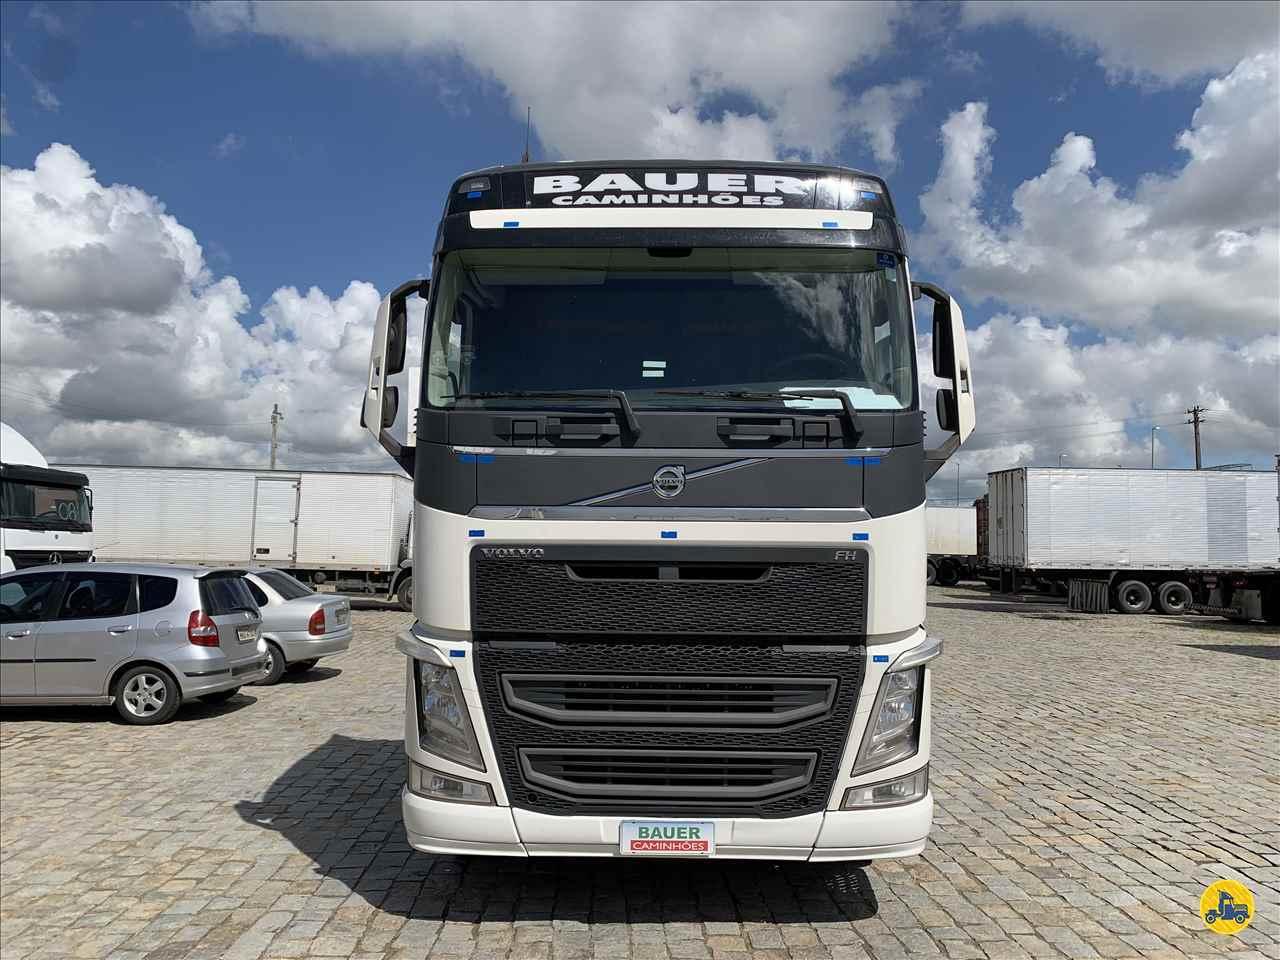 CAMINHAO VOLVO VOLVO FH 500 Cavalo Mecânico Truck 6x2 Bauer Caminhões ITAJAI SANTA CATARINA SC